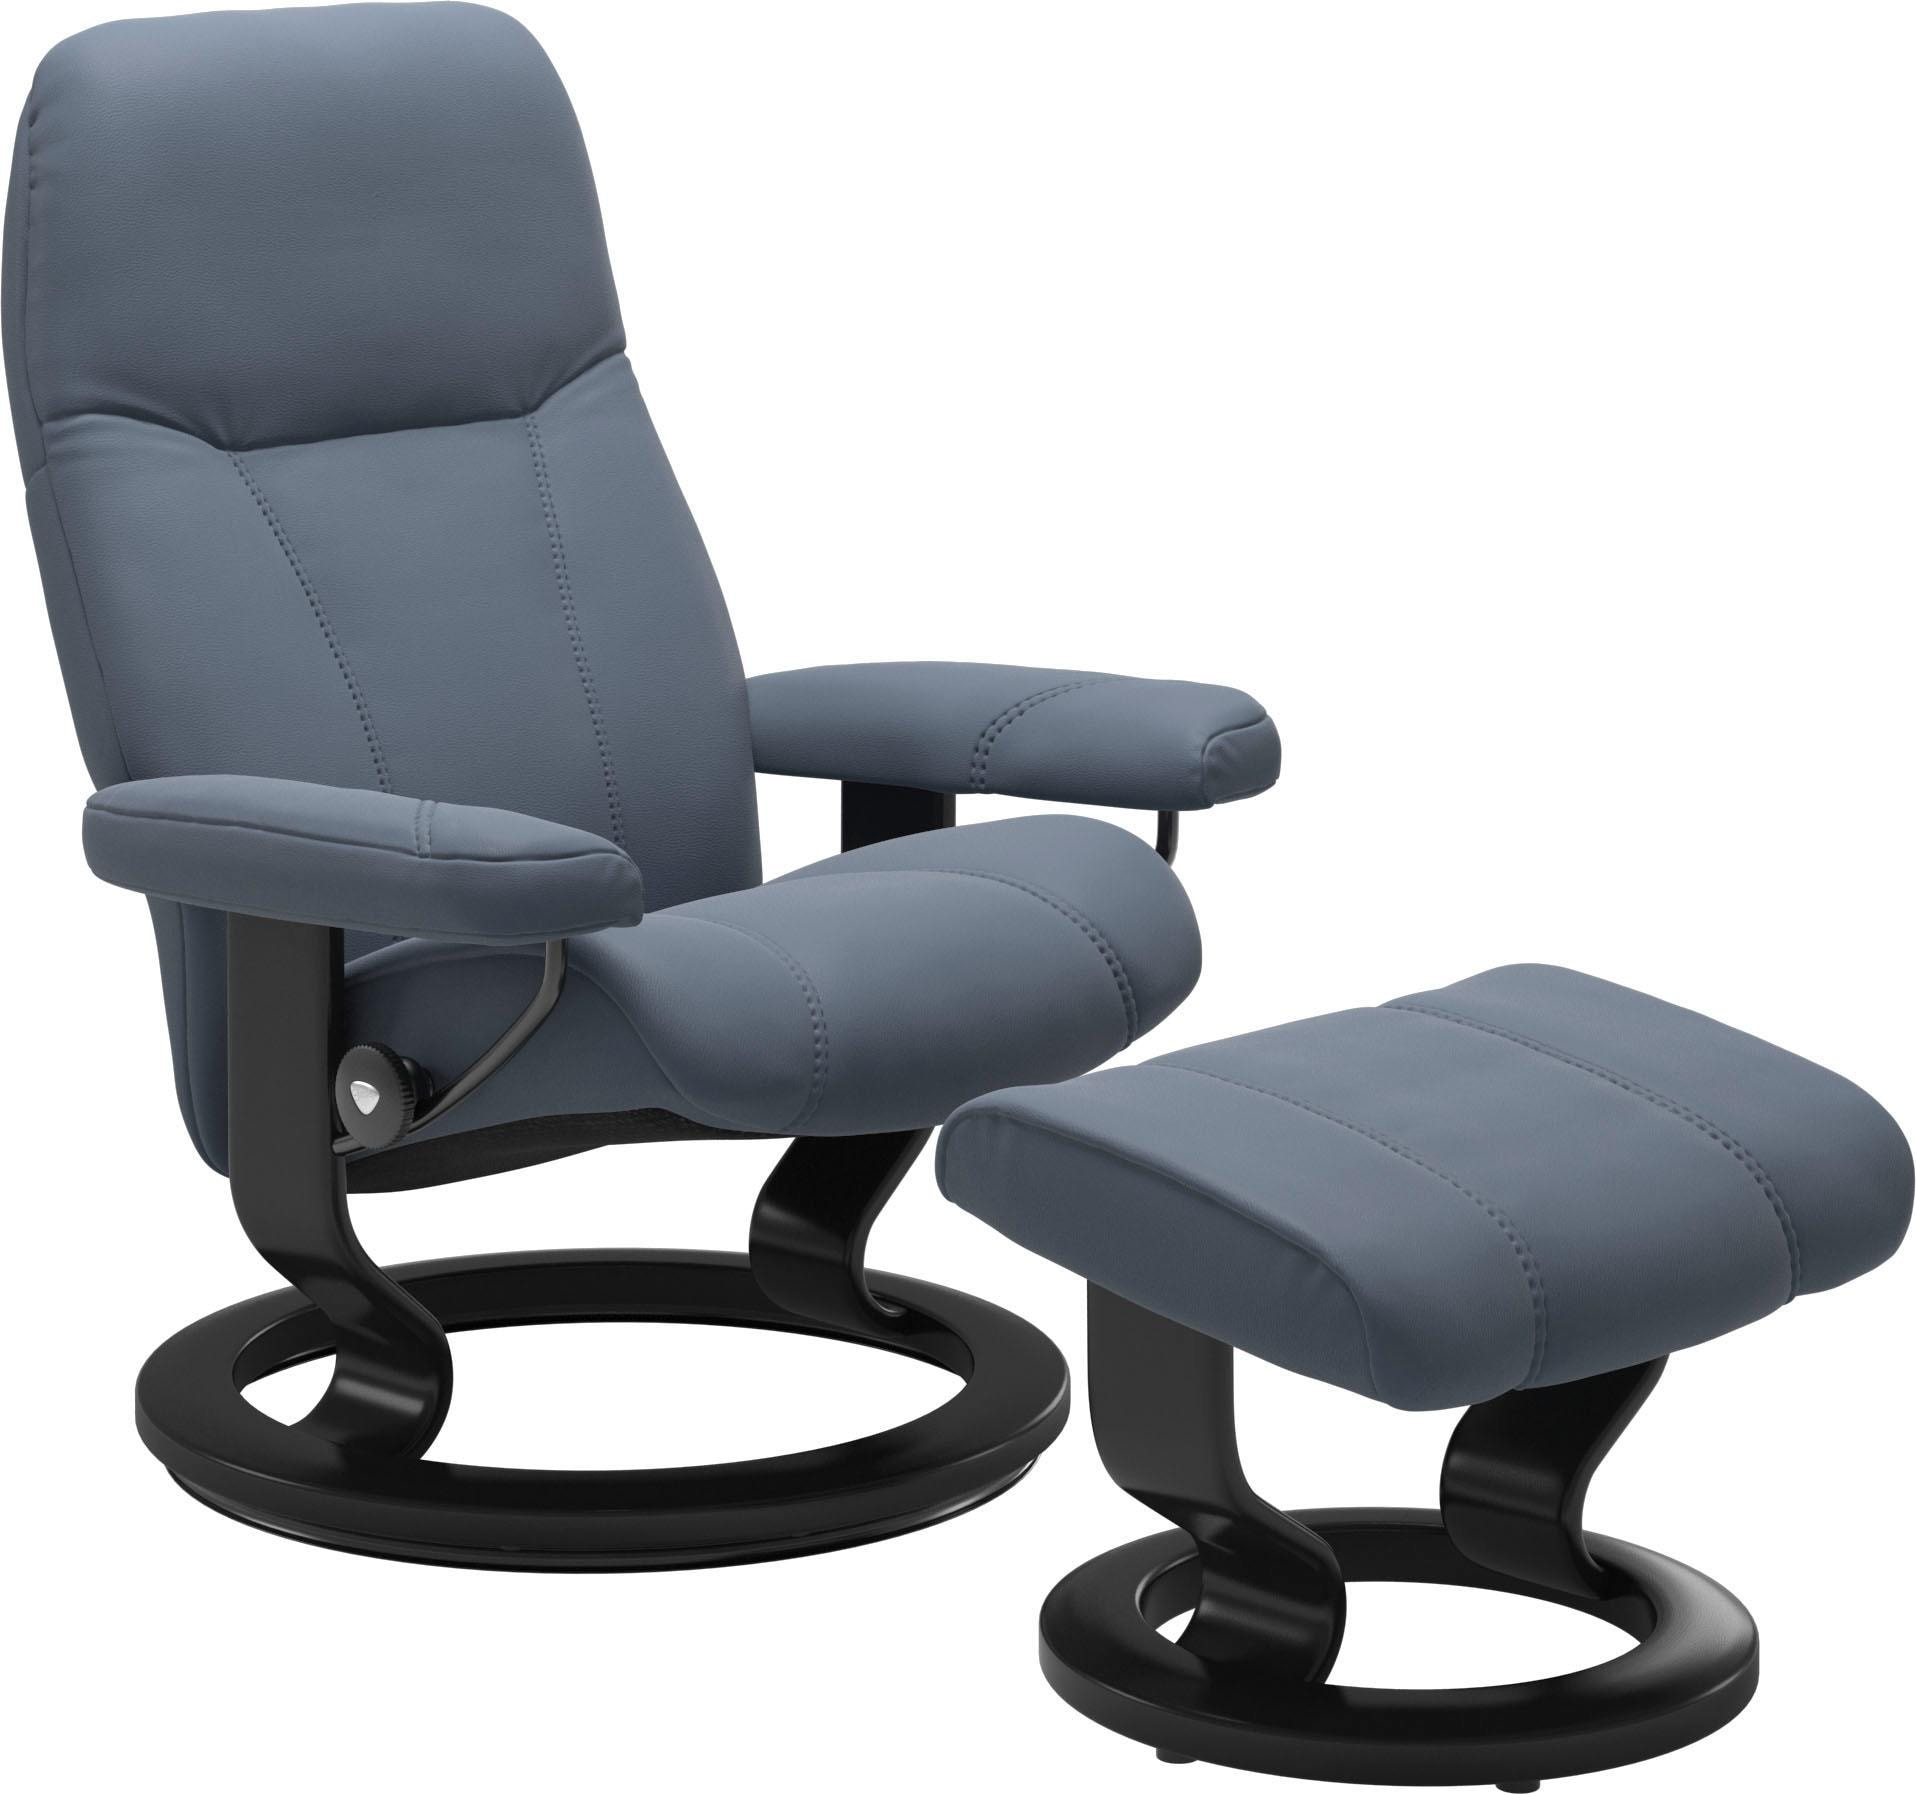 Stressless Relaxsessel Consul (Set) | Wohnzimmer > Sessel > Relaxsessel | Stressless